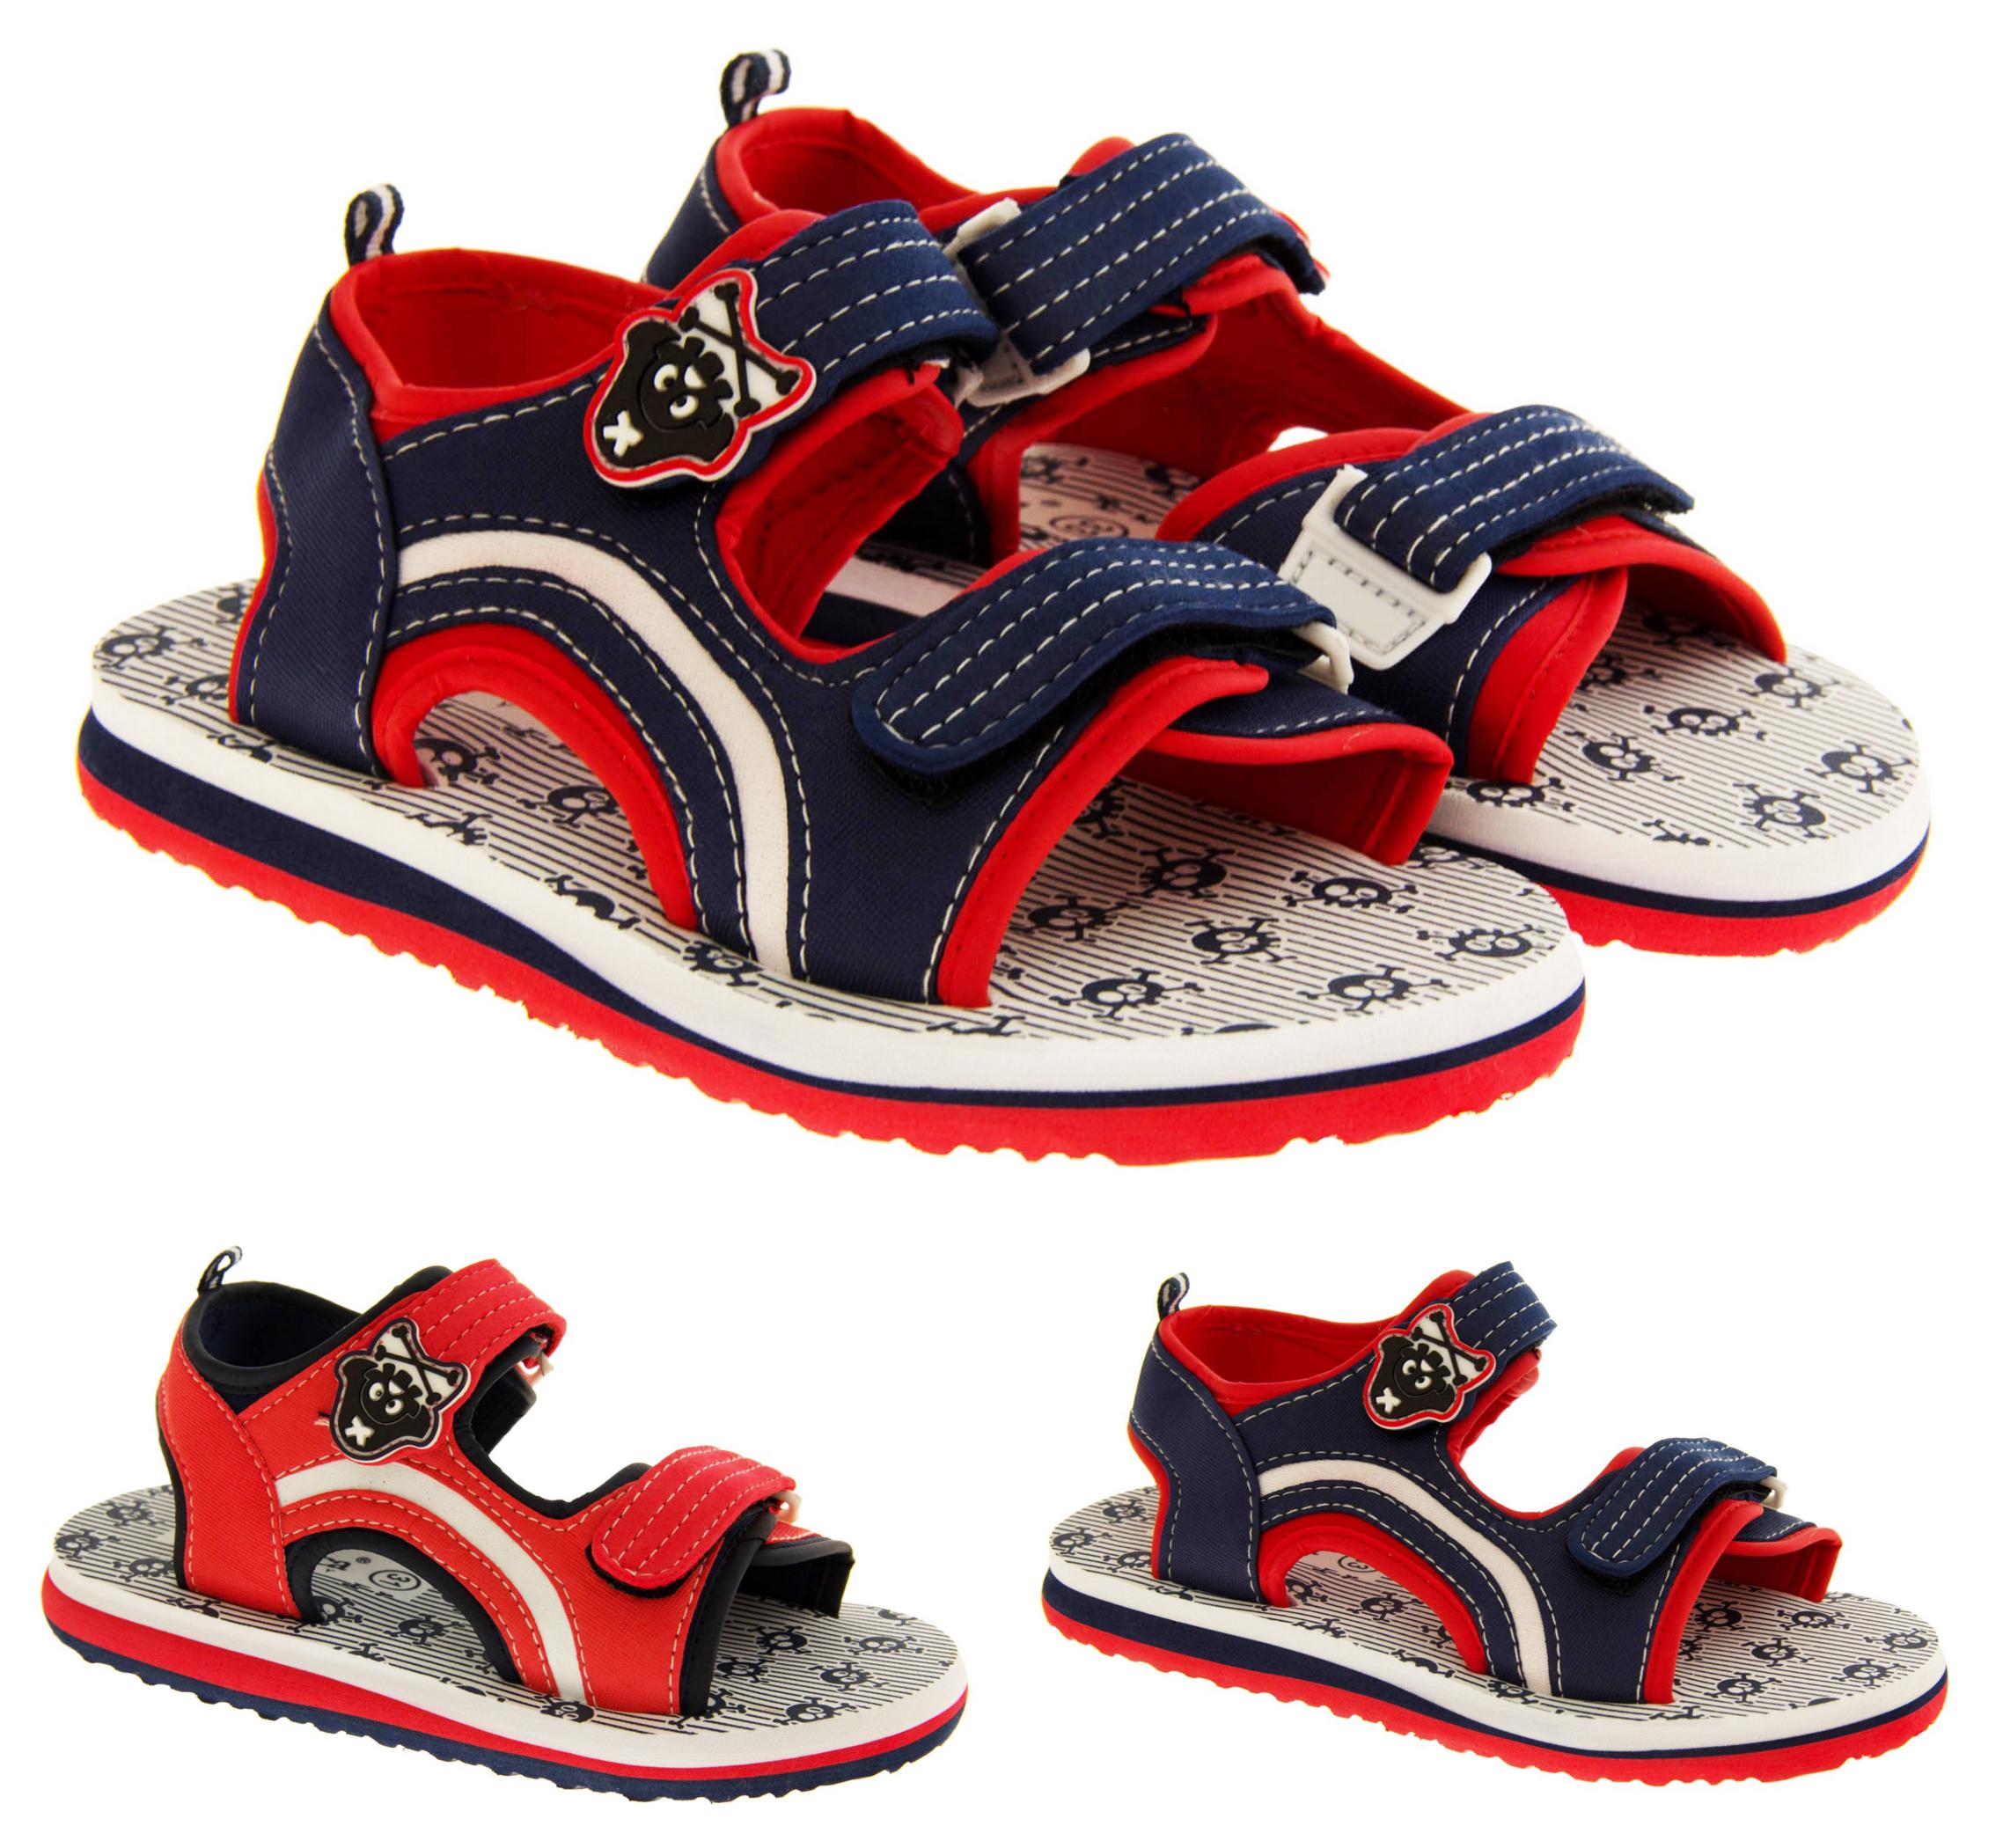 Boys Pirate Sports Beach Sandals Open Summer Low Wedge Sz Size 11 12 12.5 2.5